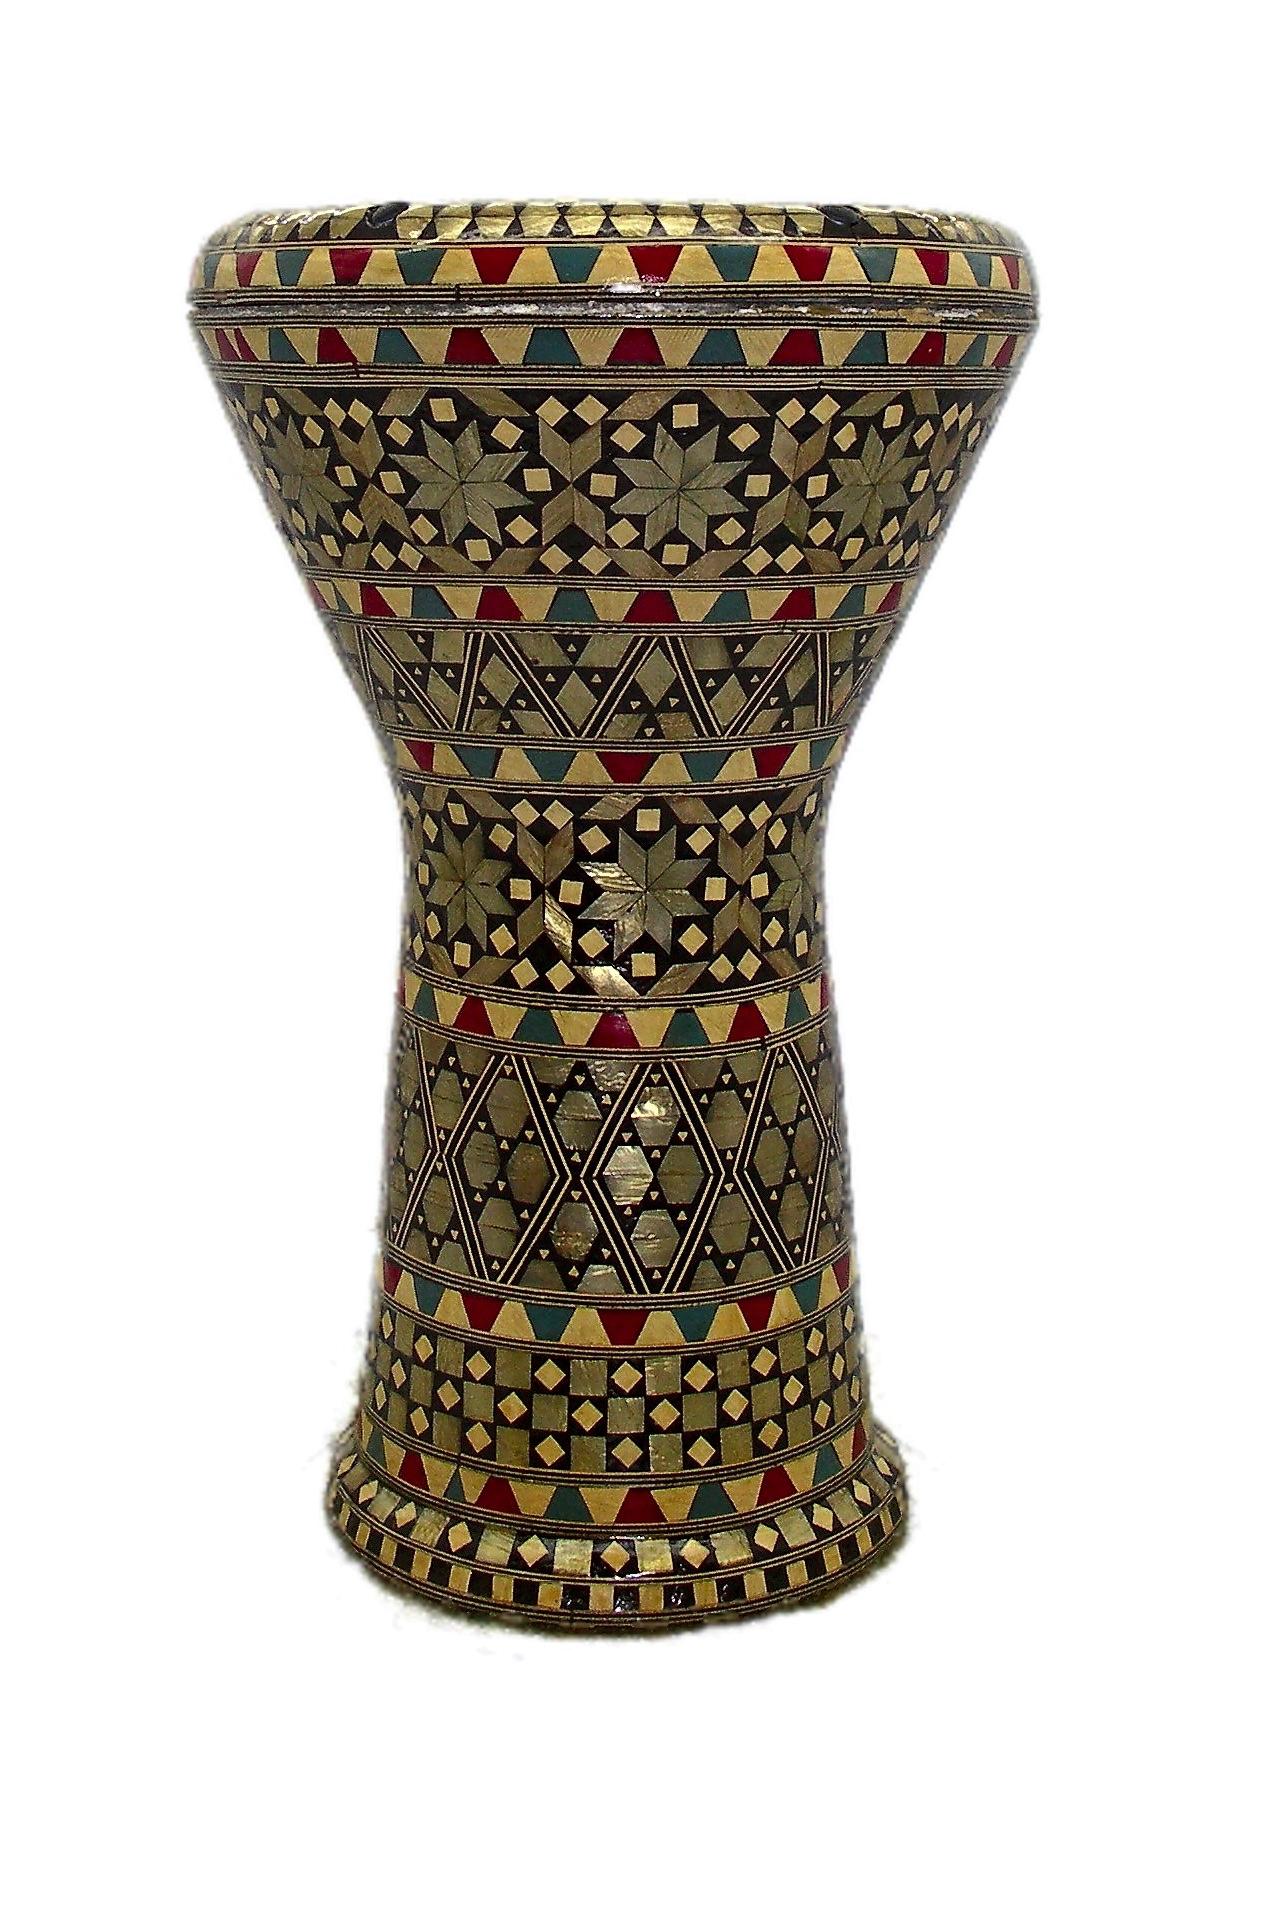 Egyptian-Eighties-MOP-RedBlueWhite-Opaque-Rhythm-Fusion-Head-Darabuka